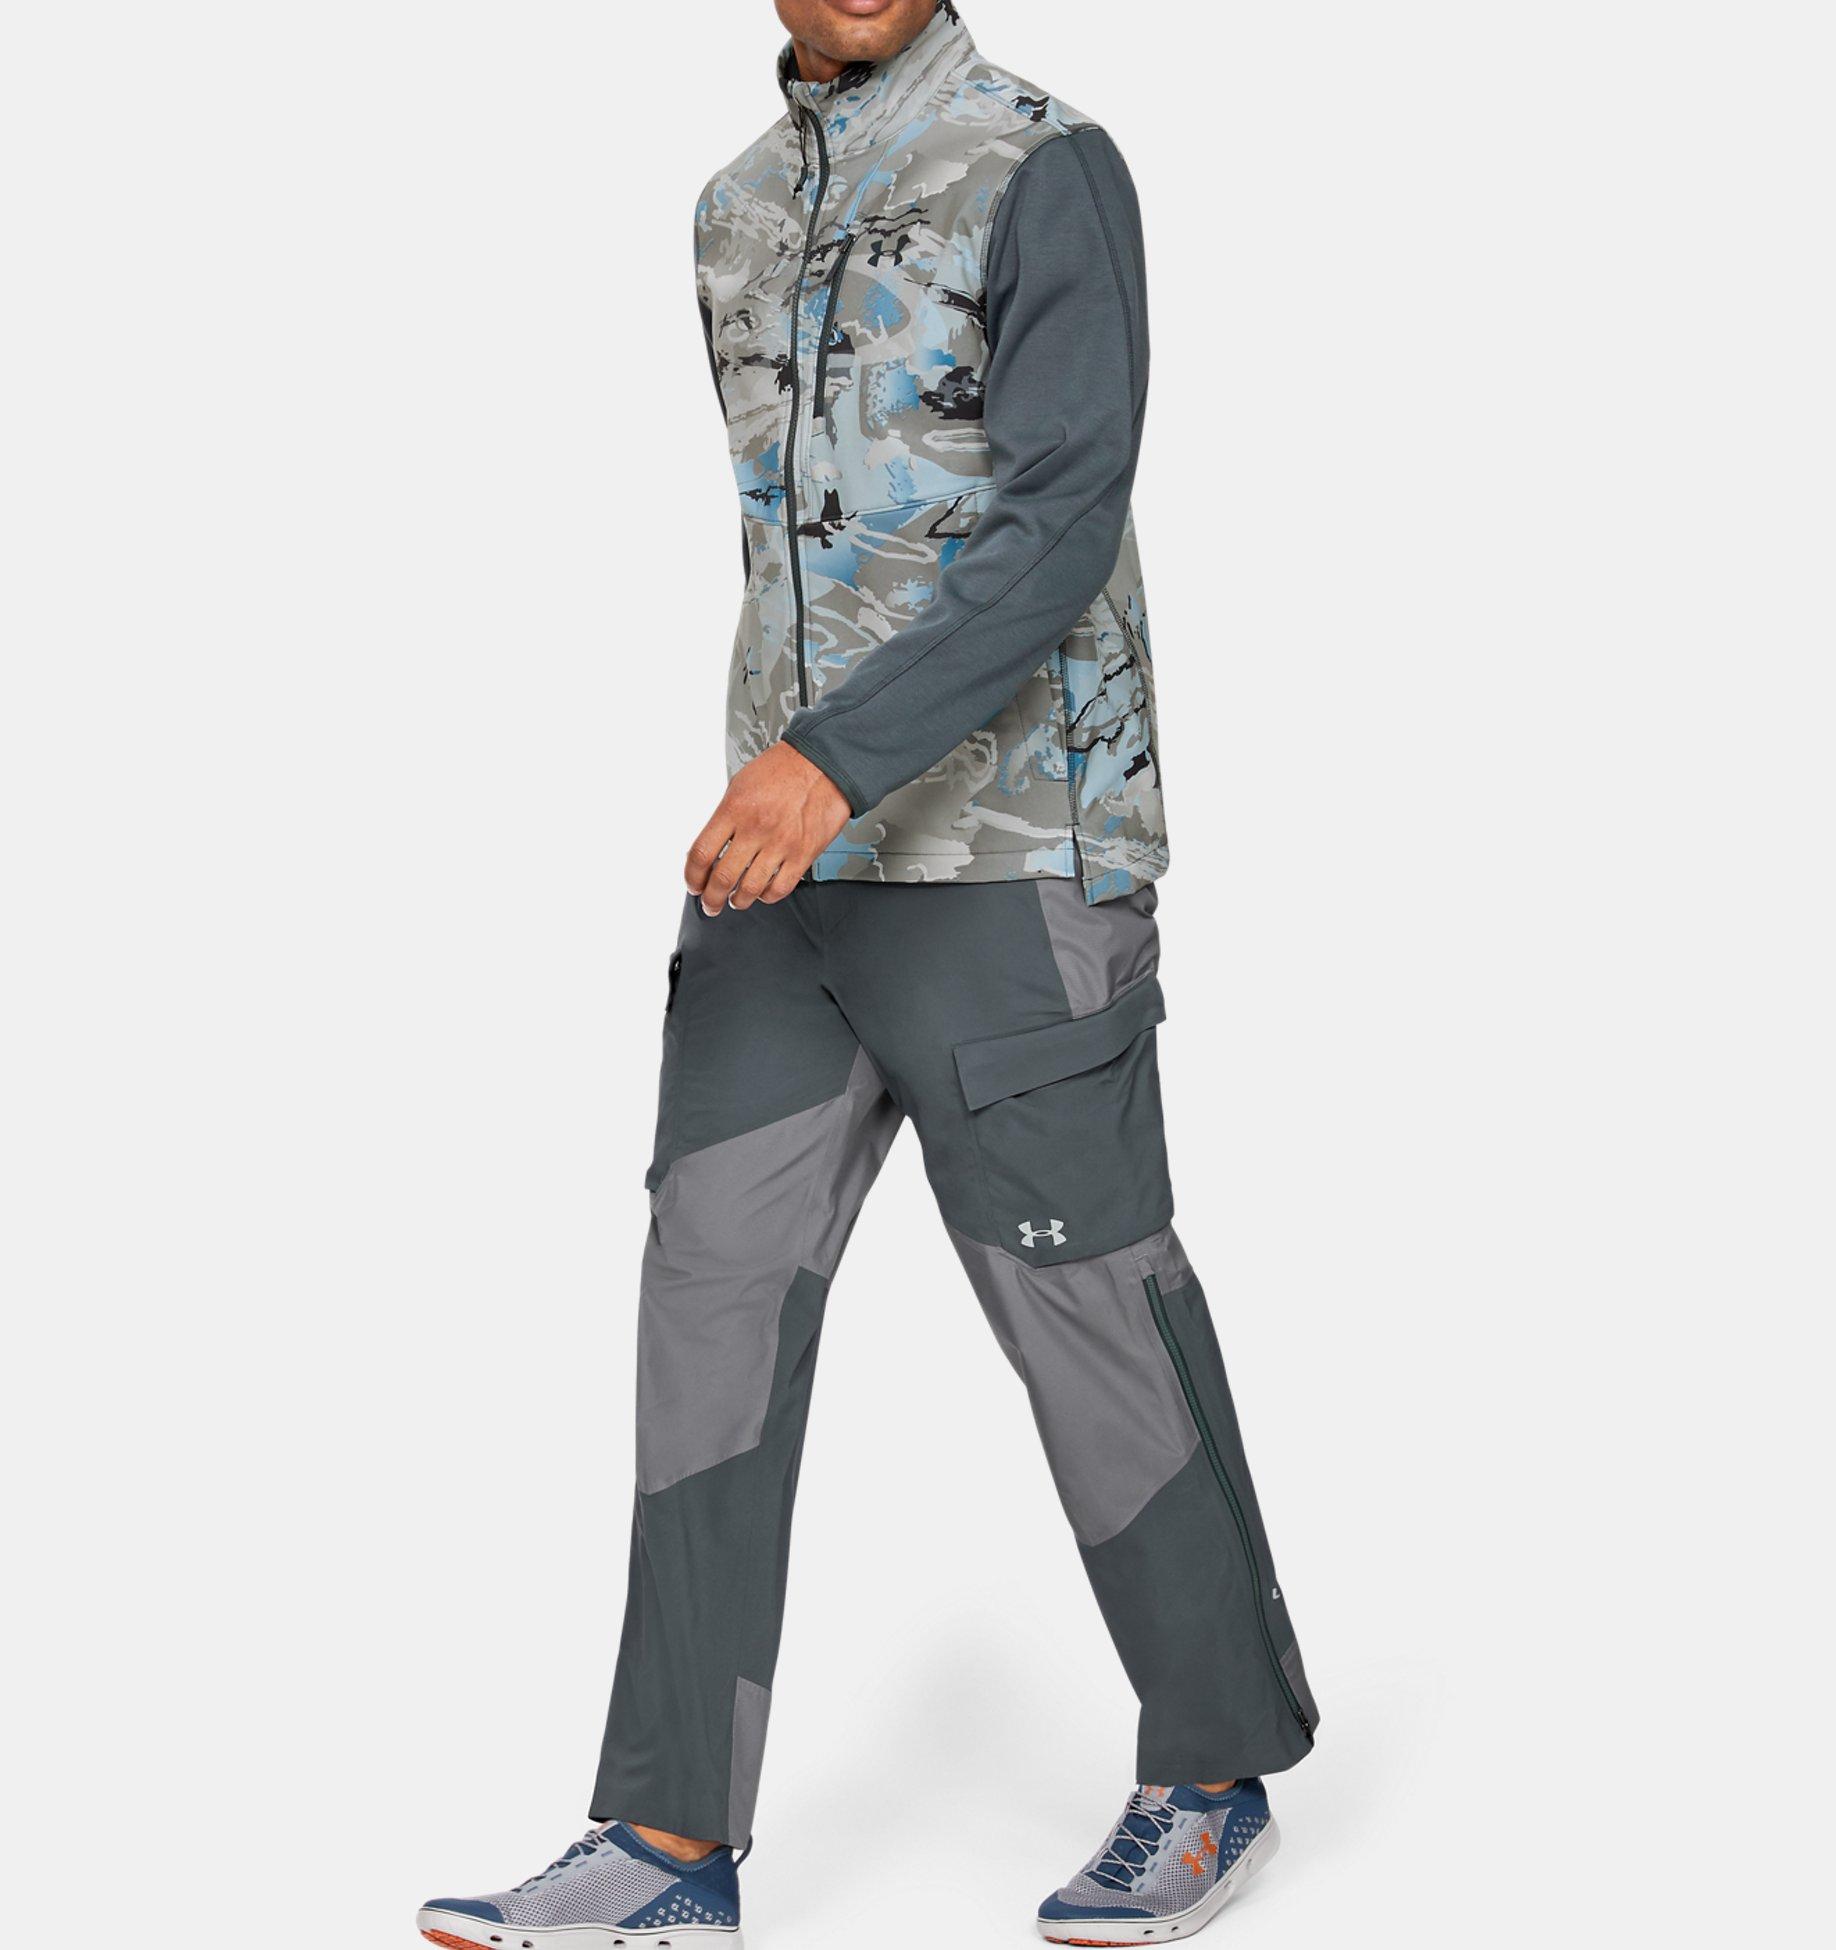 Underarmour Mens UA Shoreman Hybrid Jacket